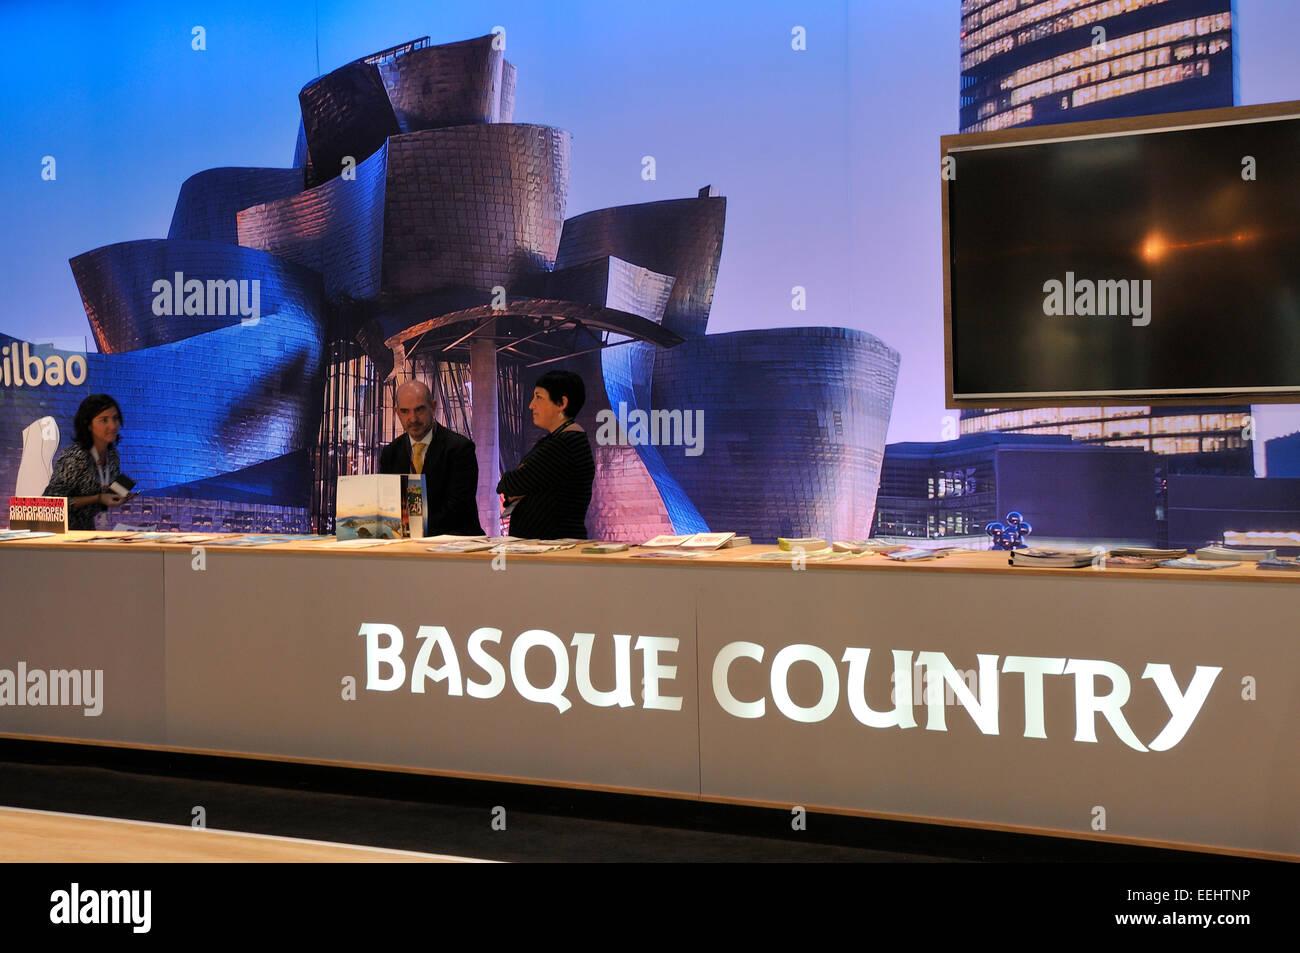 Exhibition Stand In Spanish : Exhibition stands in hamburg